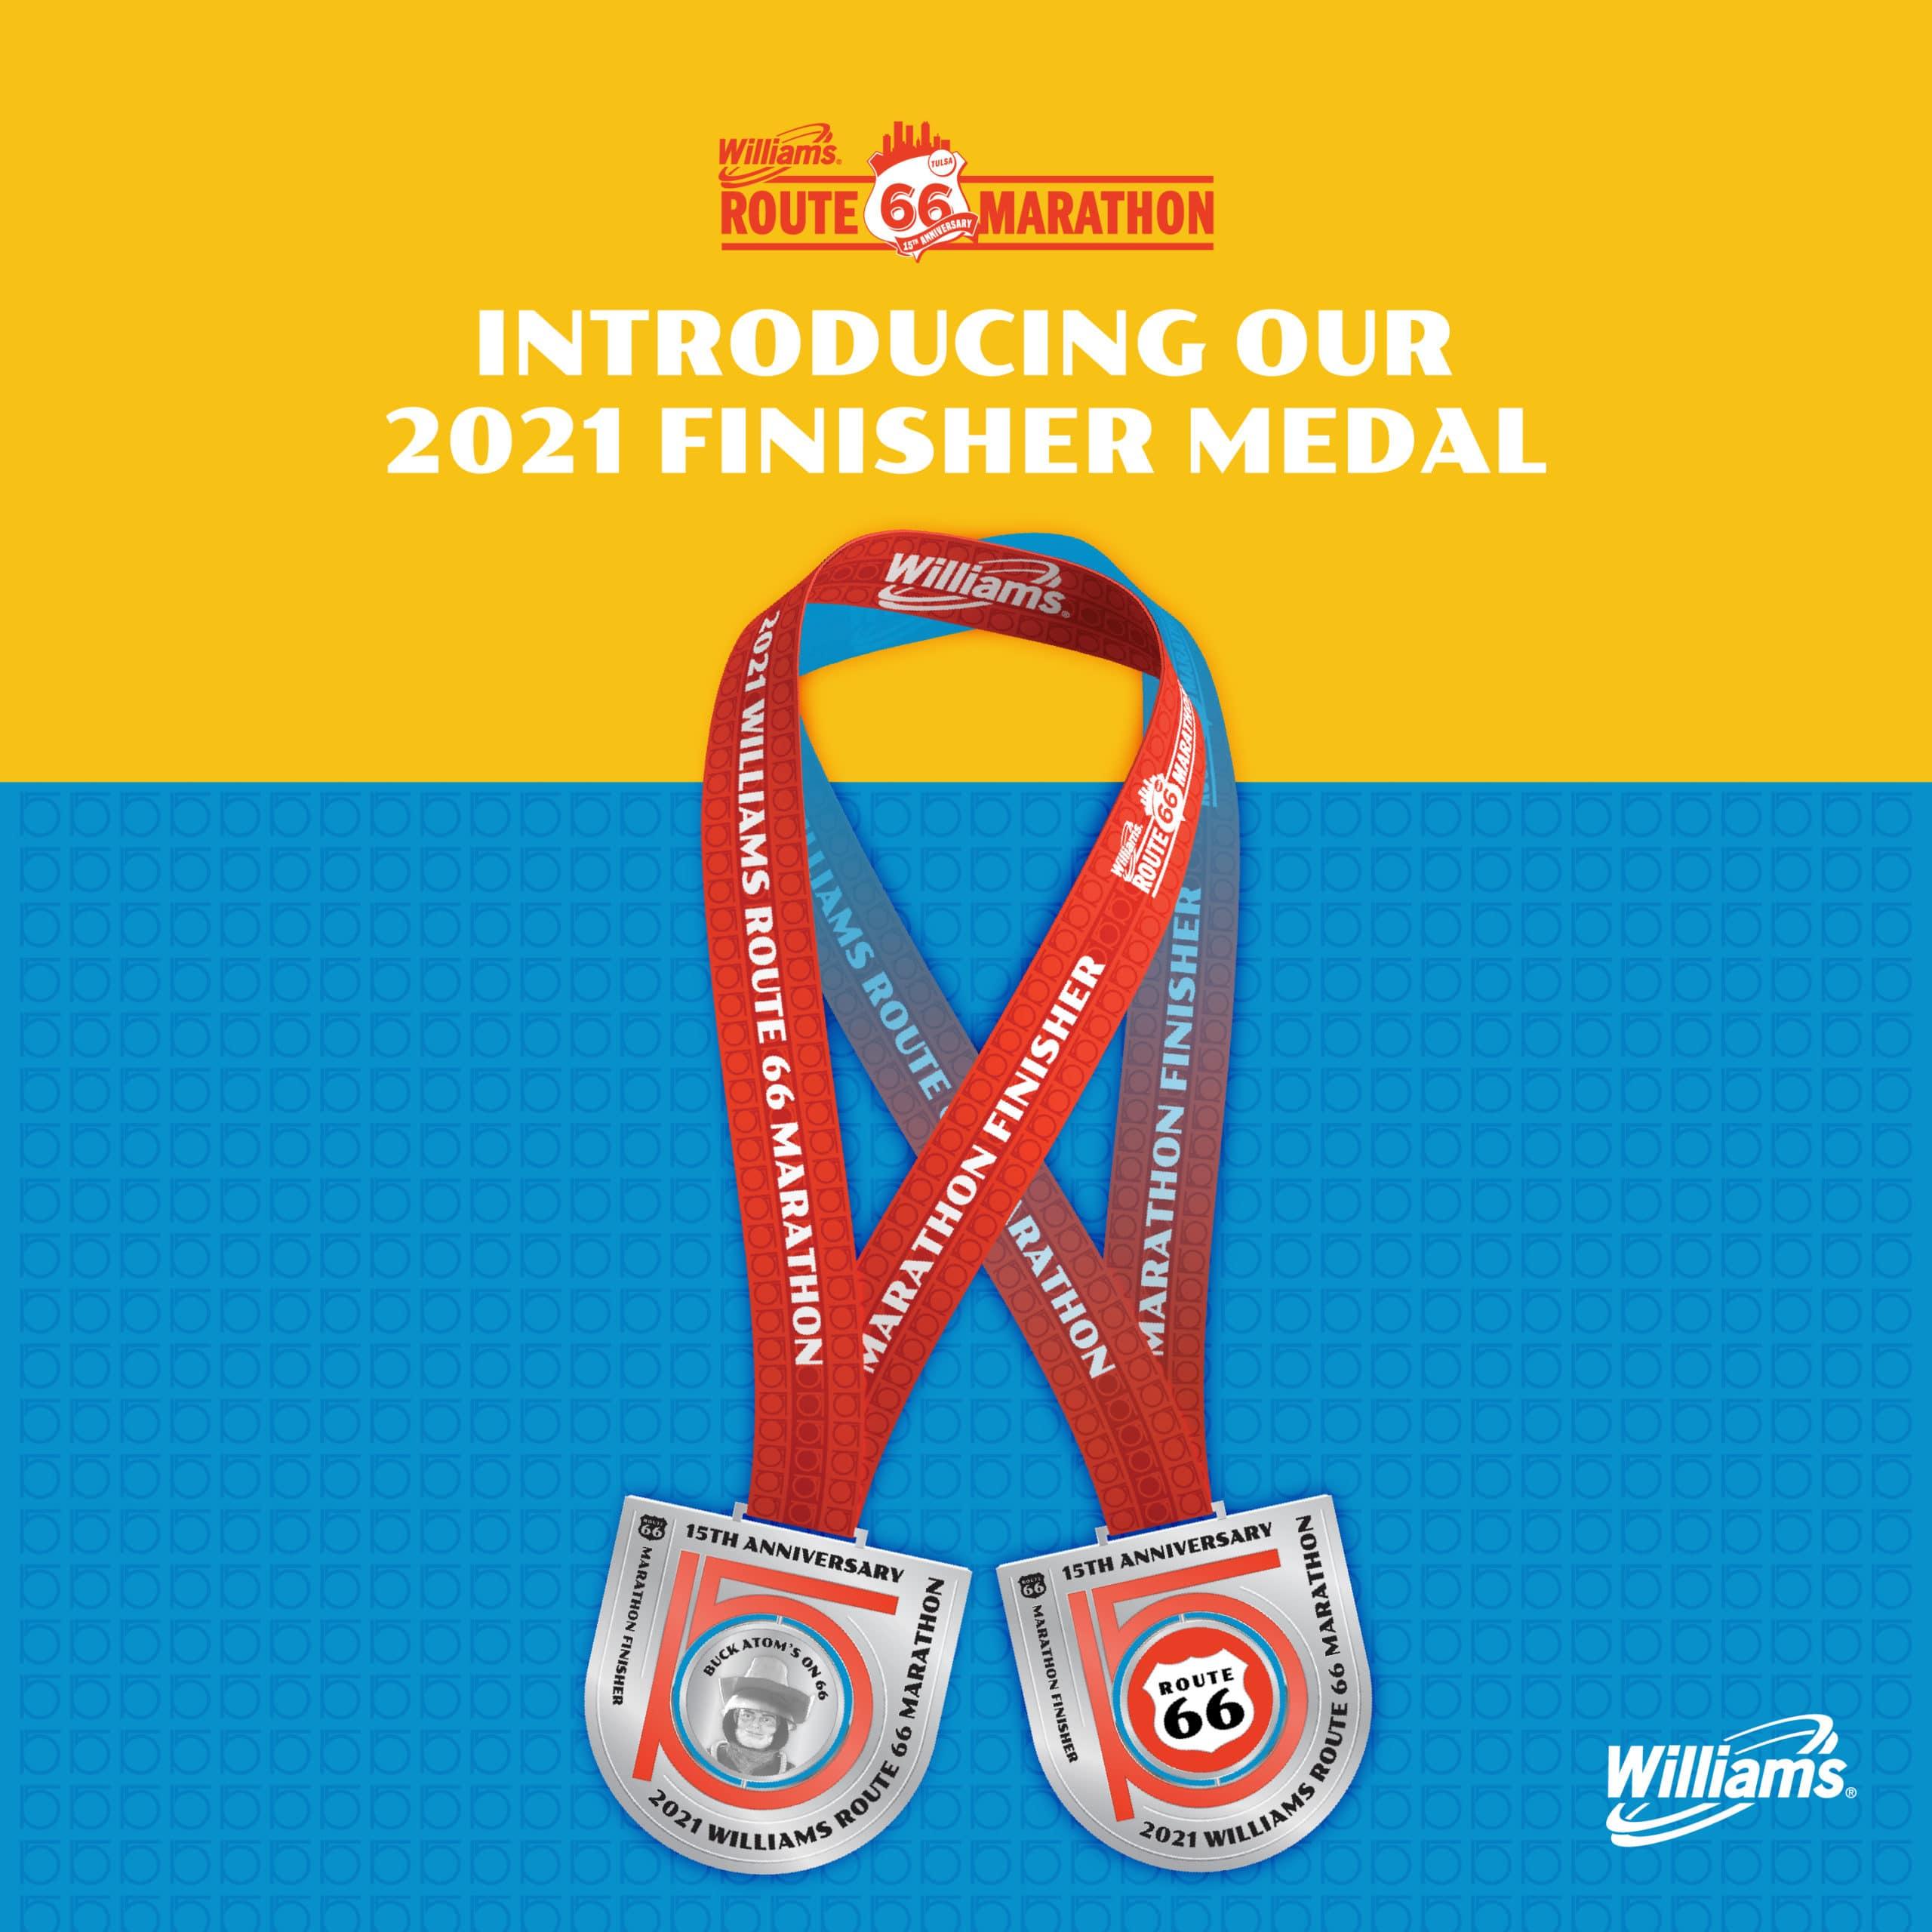 R66 Marathon Medal Reveal Social